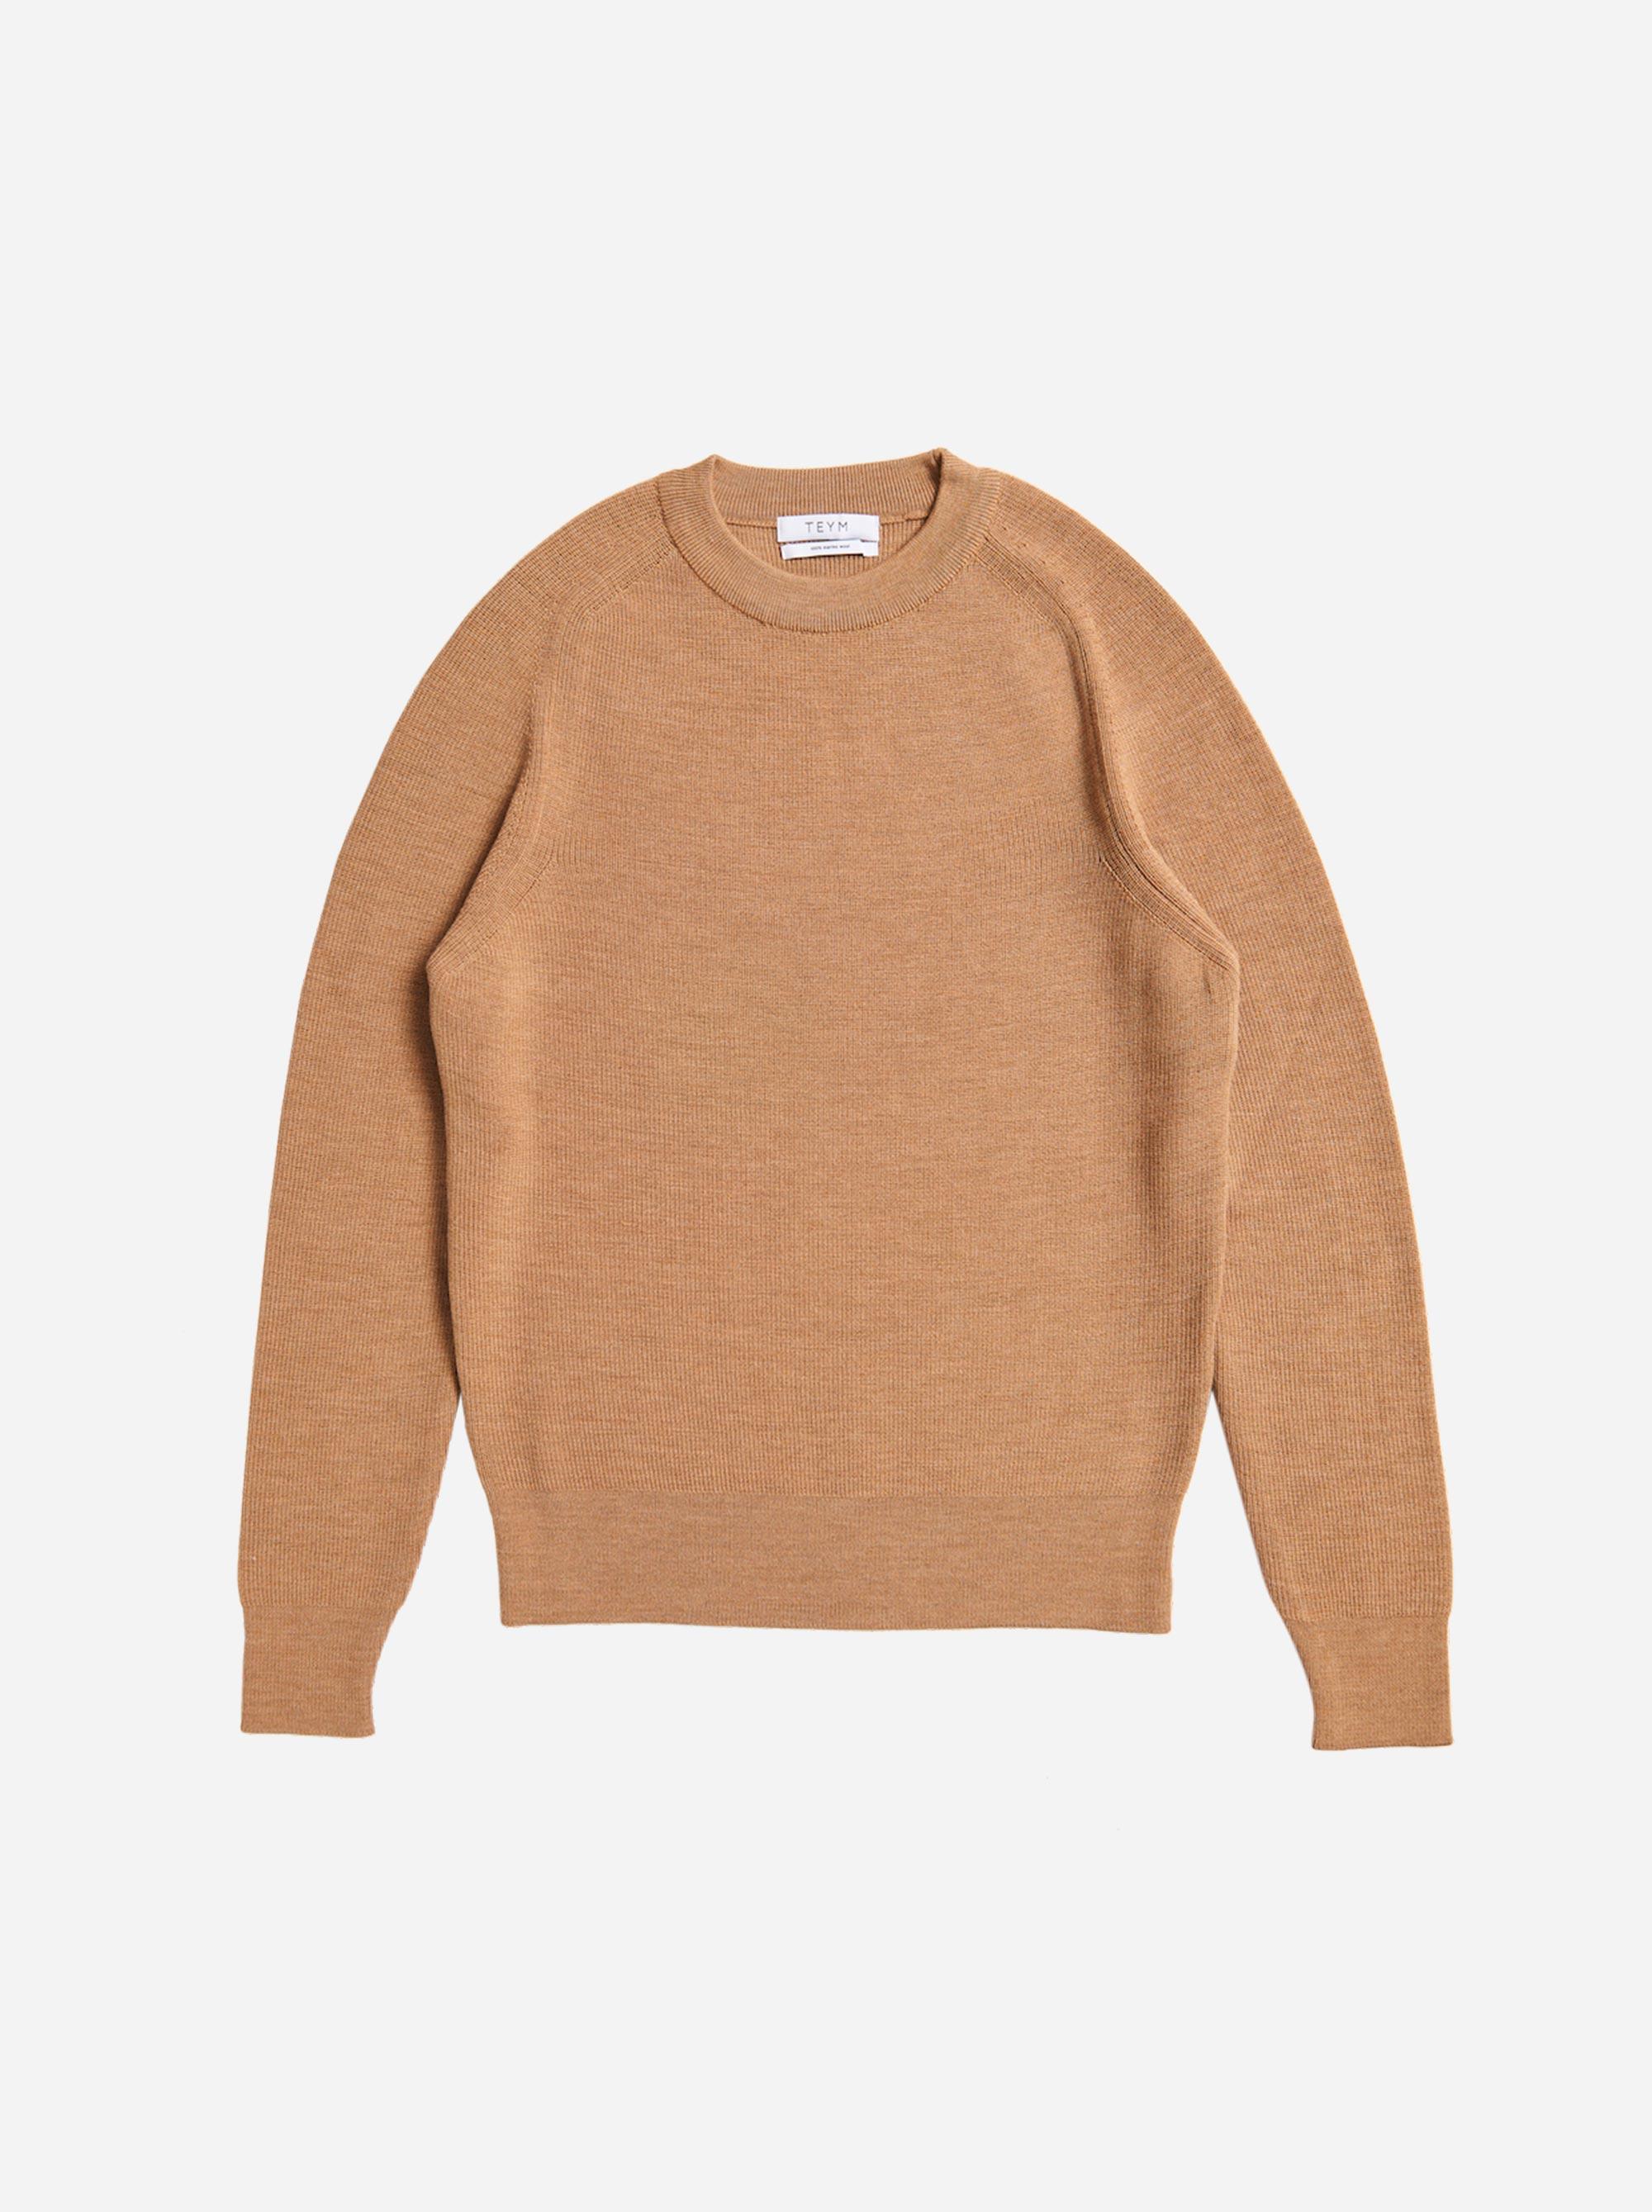 Teym - Crewneck - The Merino Sweater - Women - Camel - 4